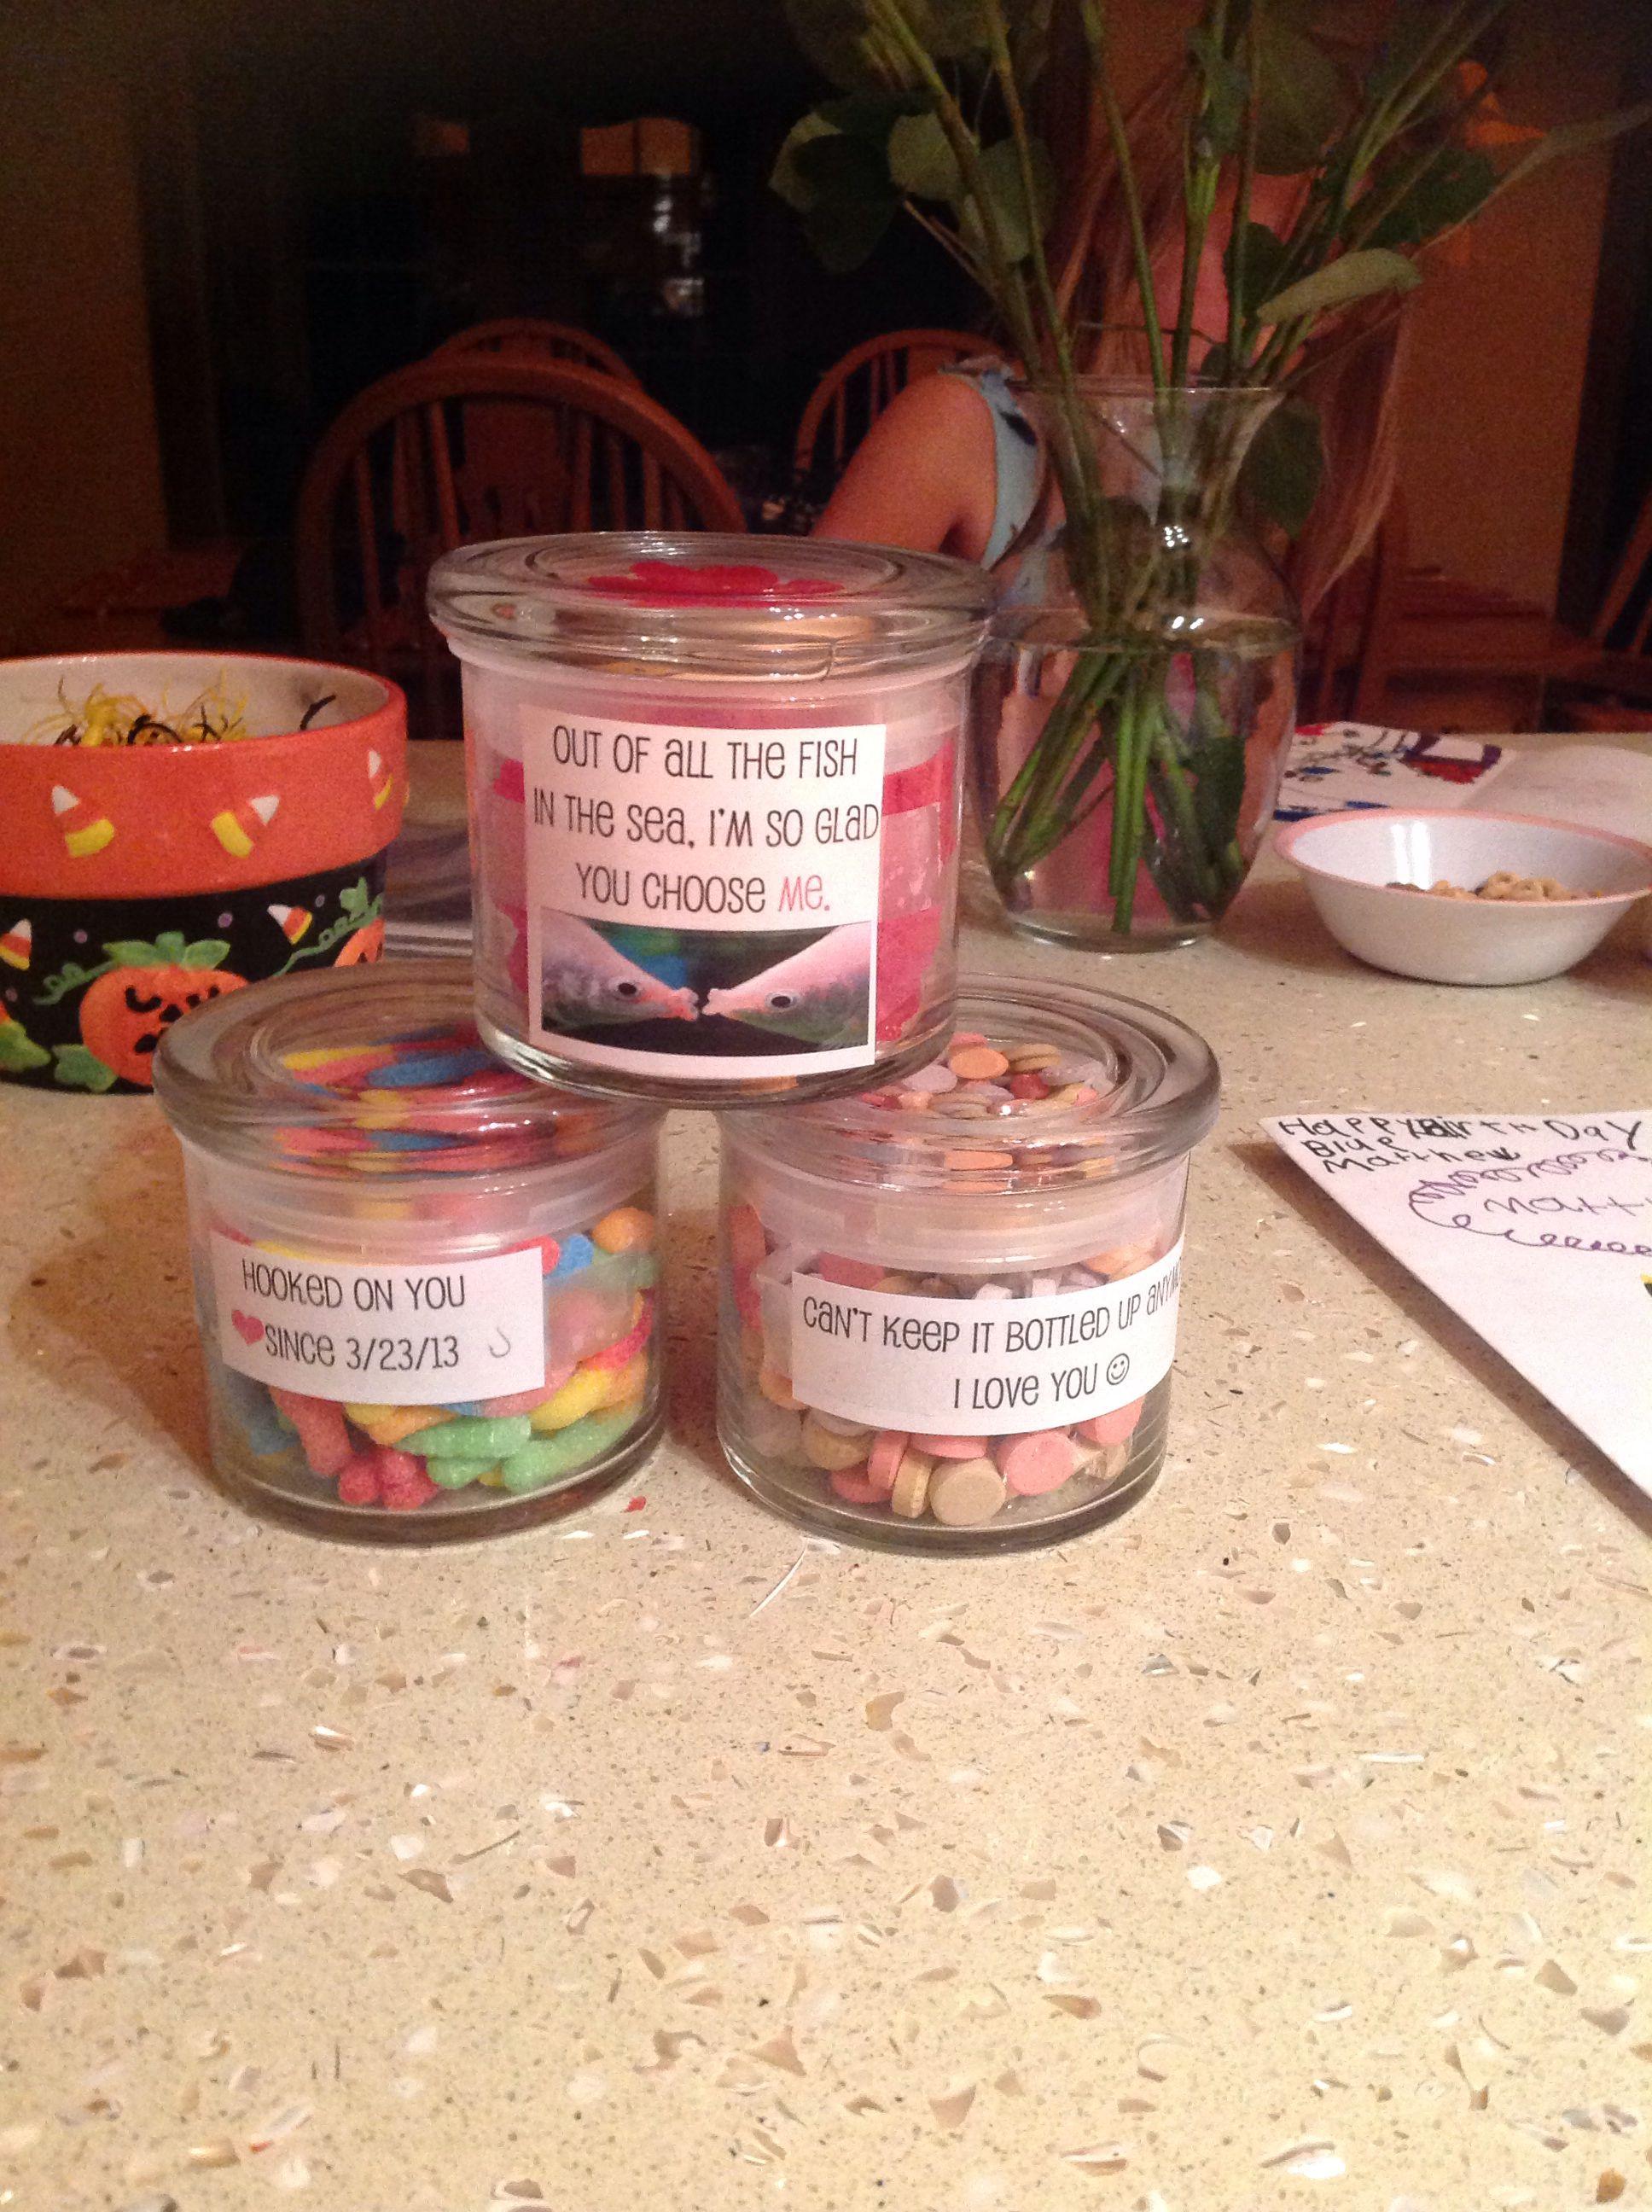 My Candy Jars For My Sweet Boyfriend Jar Gifts Sweet Boyfriend Boyfriend Gifts